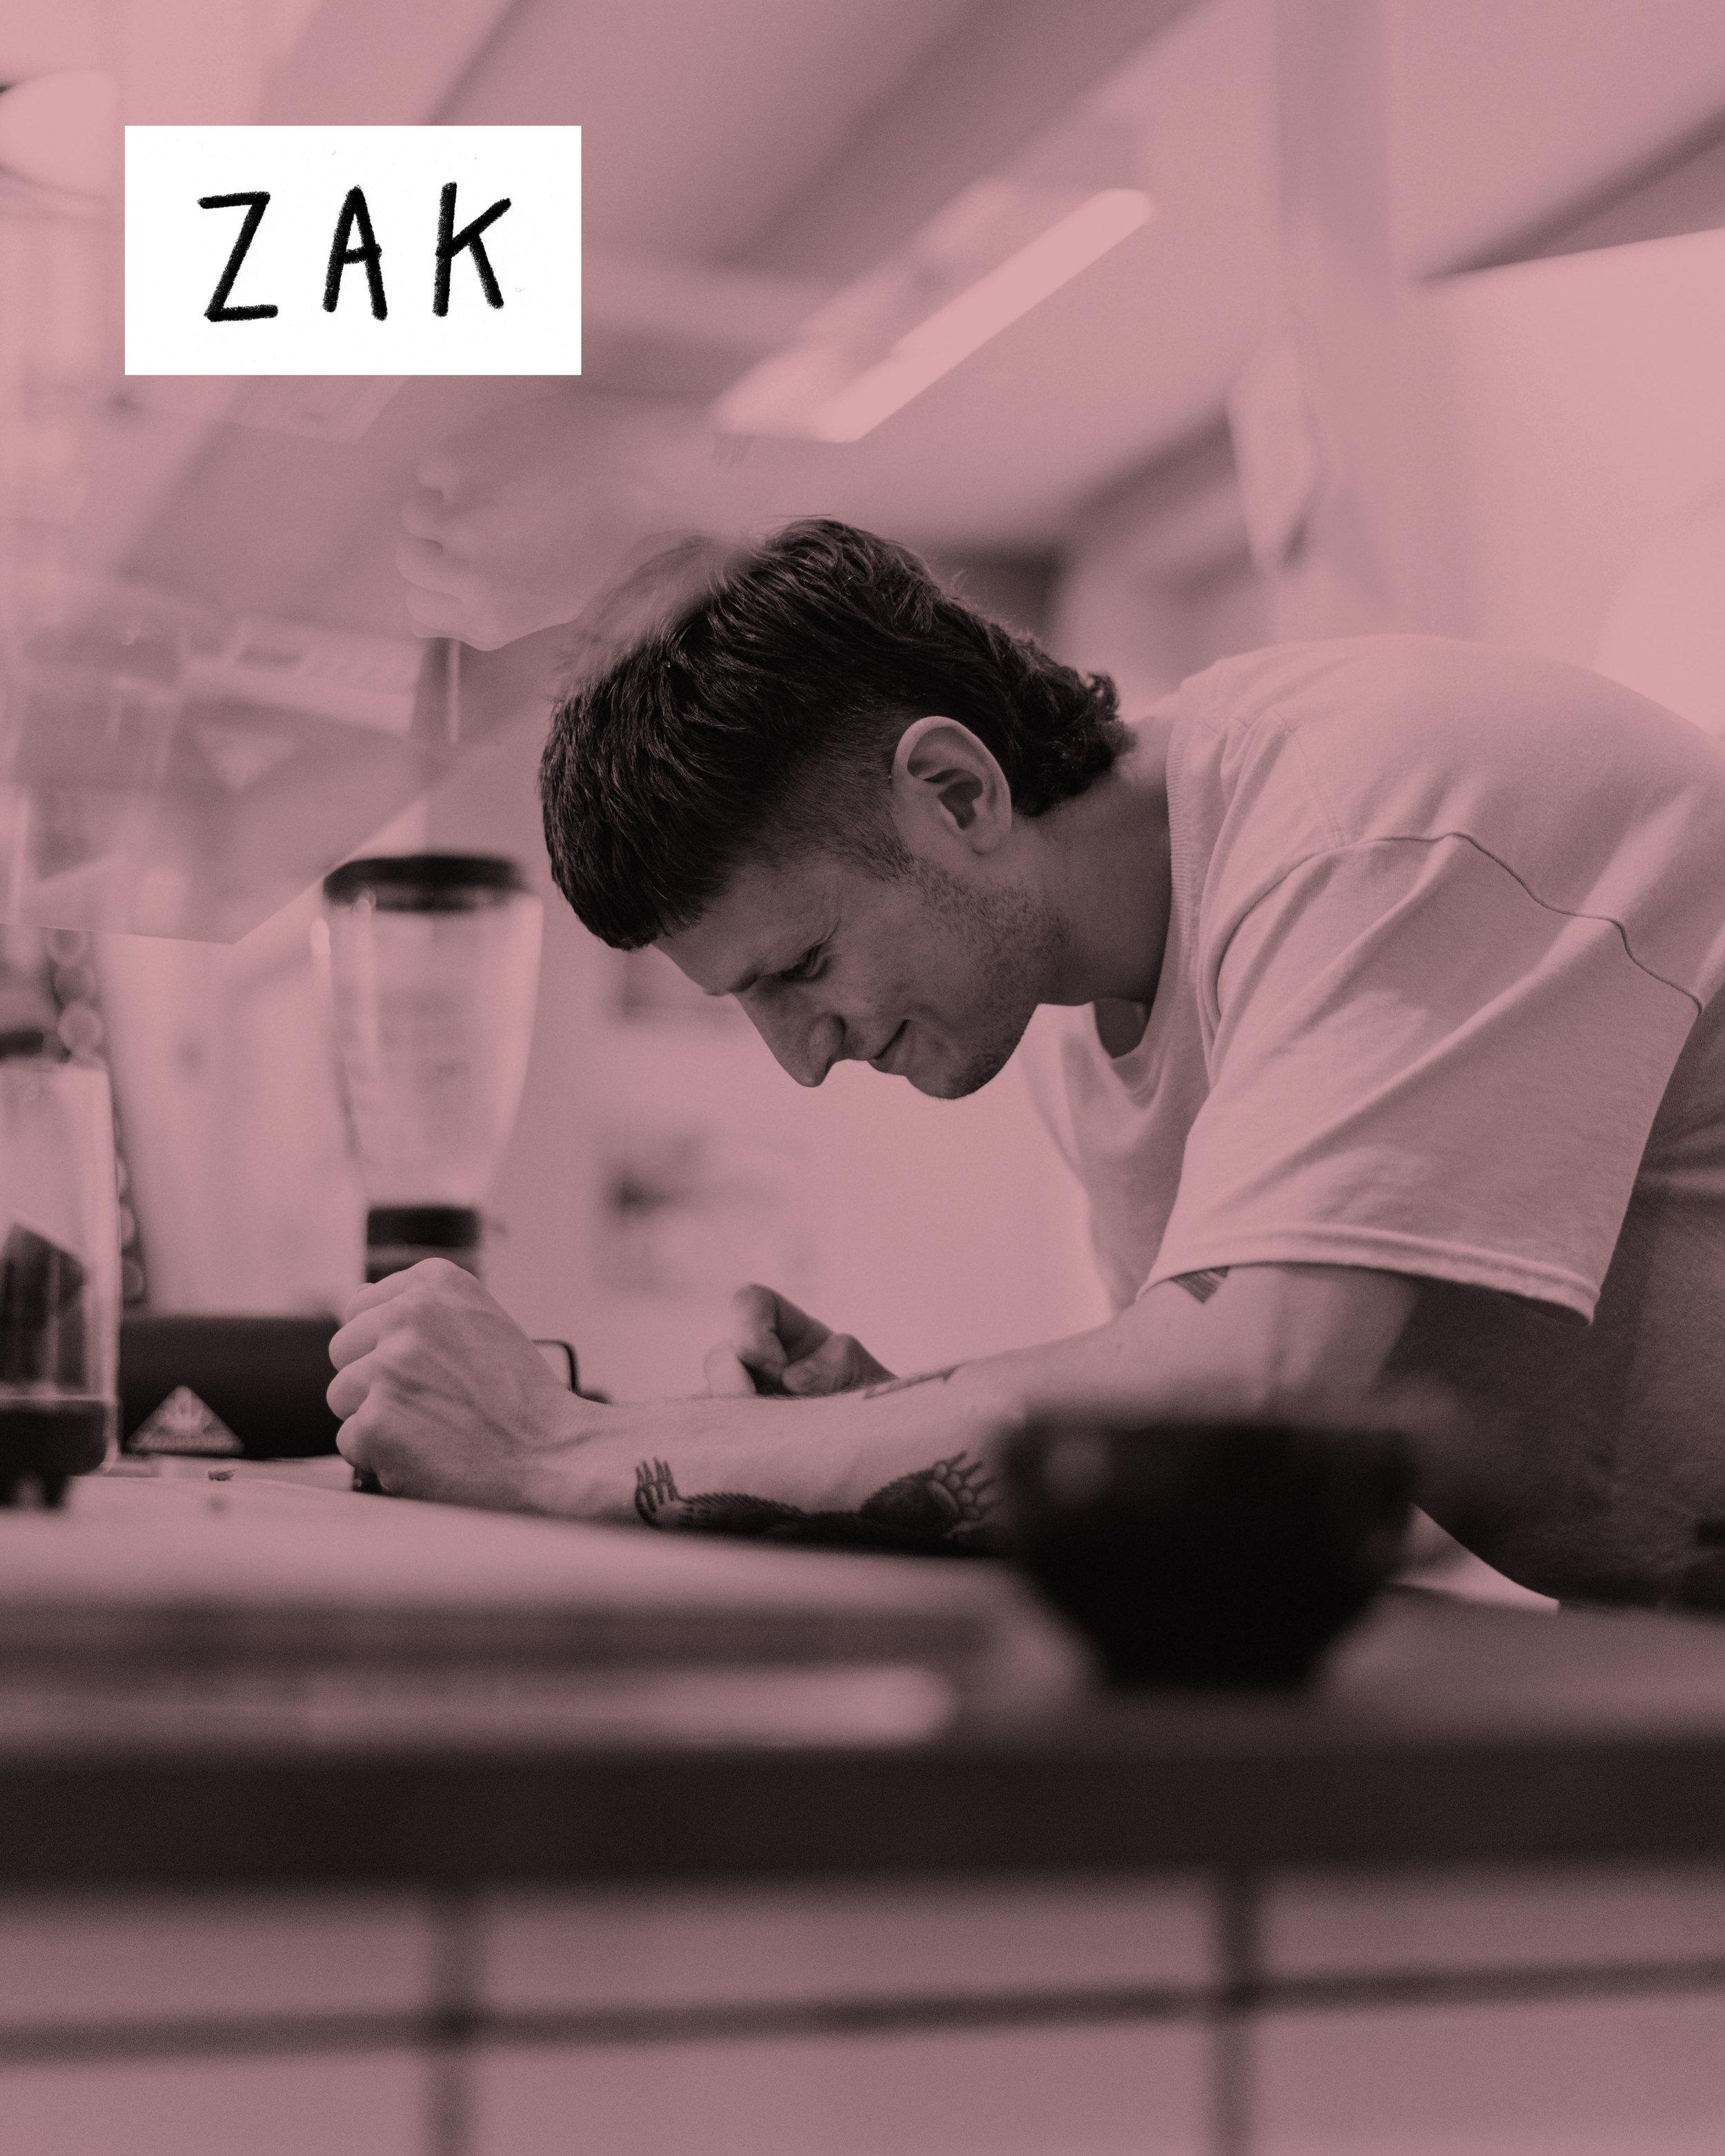 Zak Cover Image.jpg